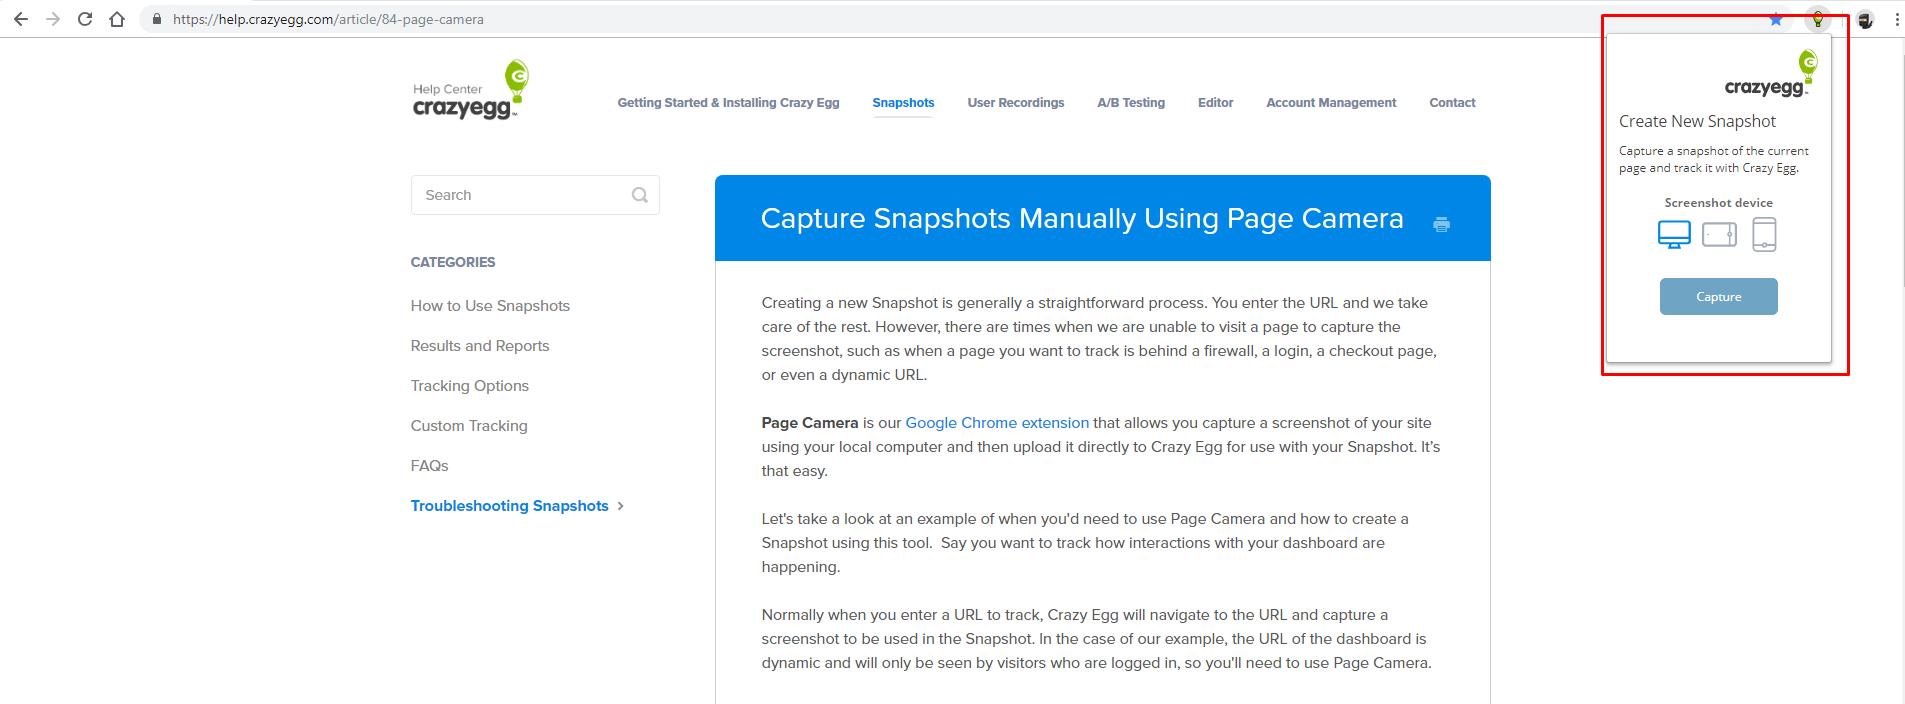 Capture Snapshots Manually Using Page Camera - Crazy Egg